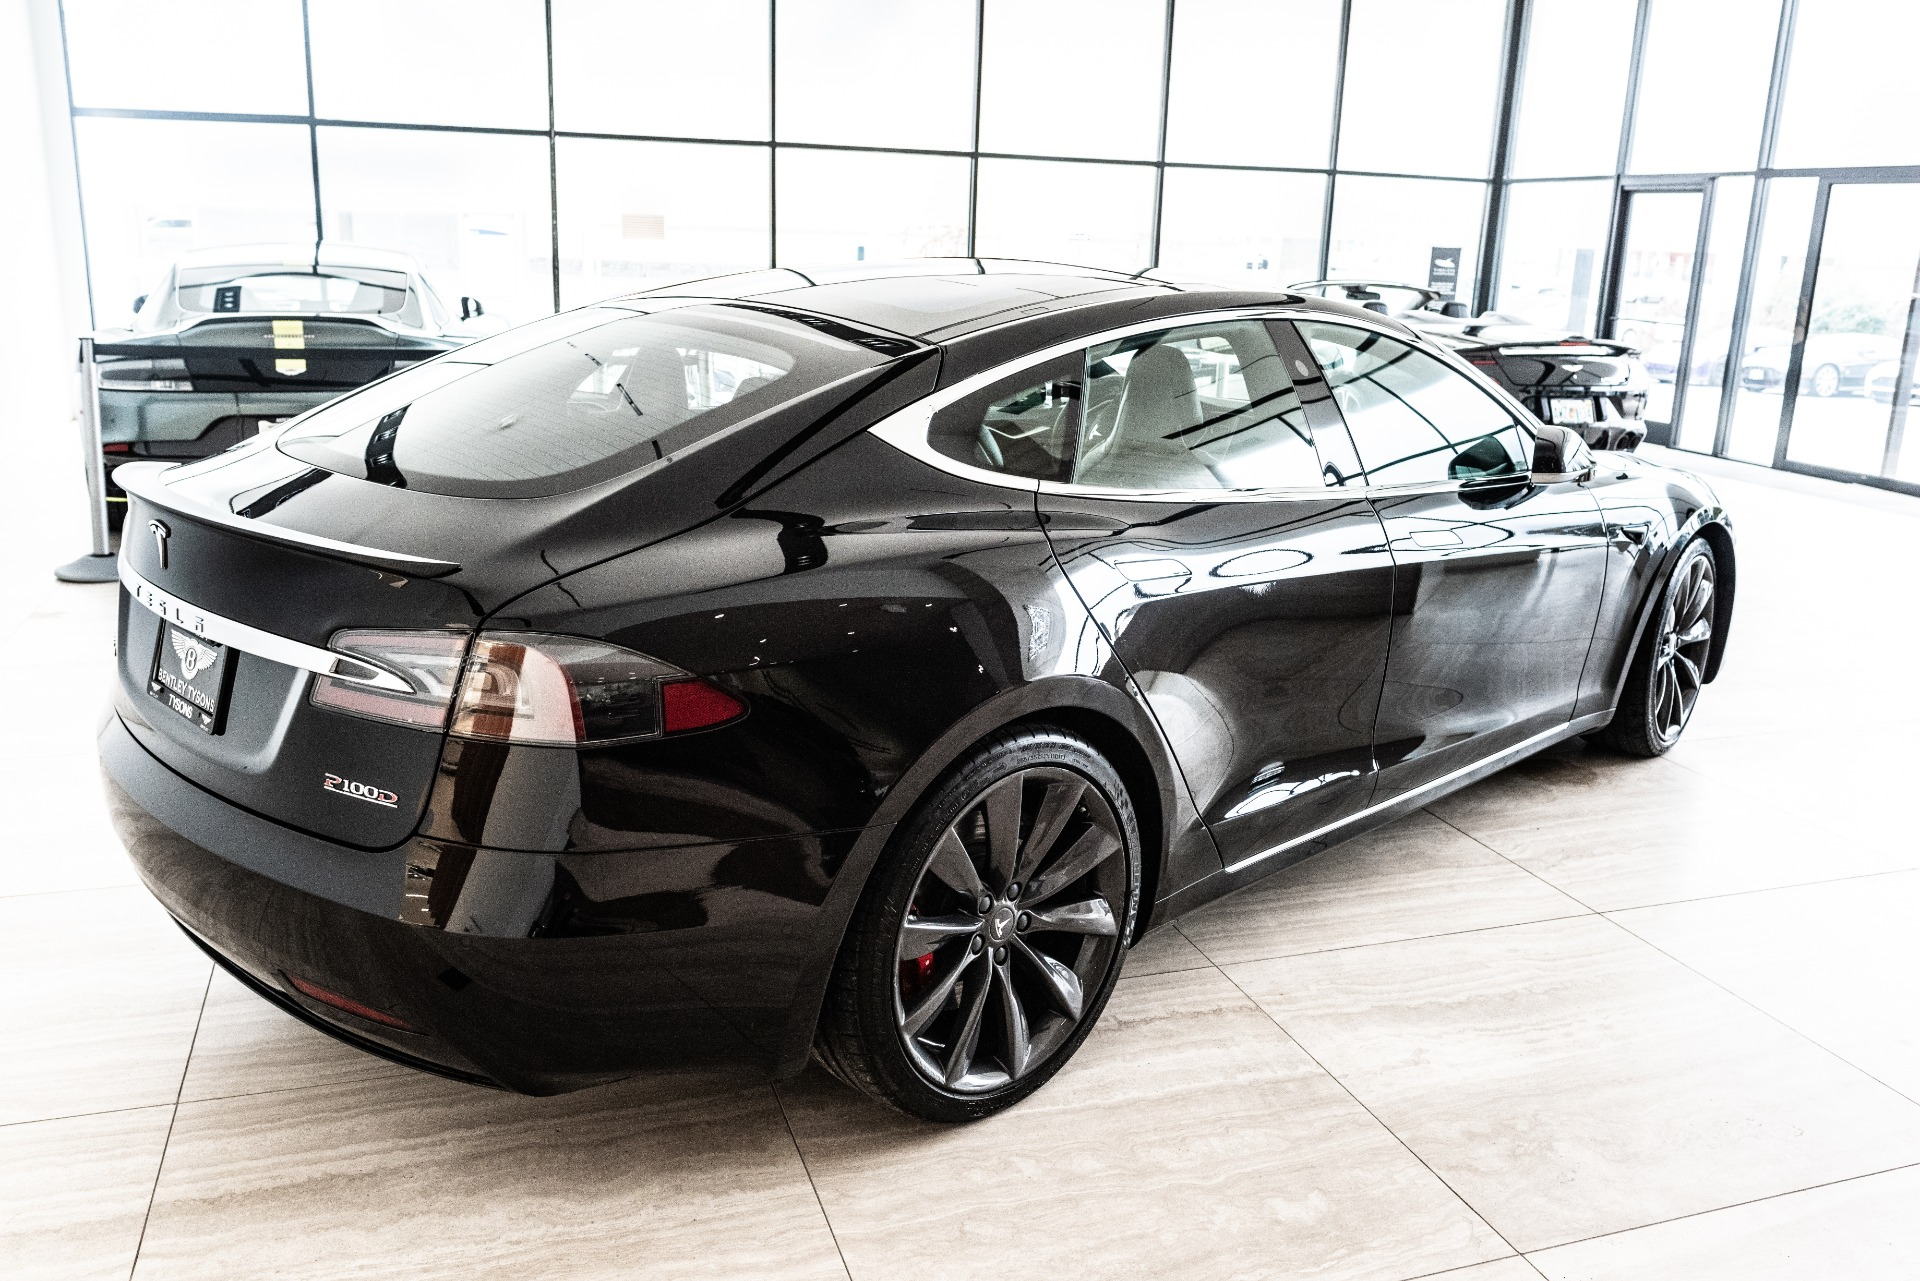 Air For Tires Near Me >> 2016 Tesla Model S P100D Stock # P102928A for sale near Vienna, VA | VA Tesla Dealer